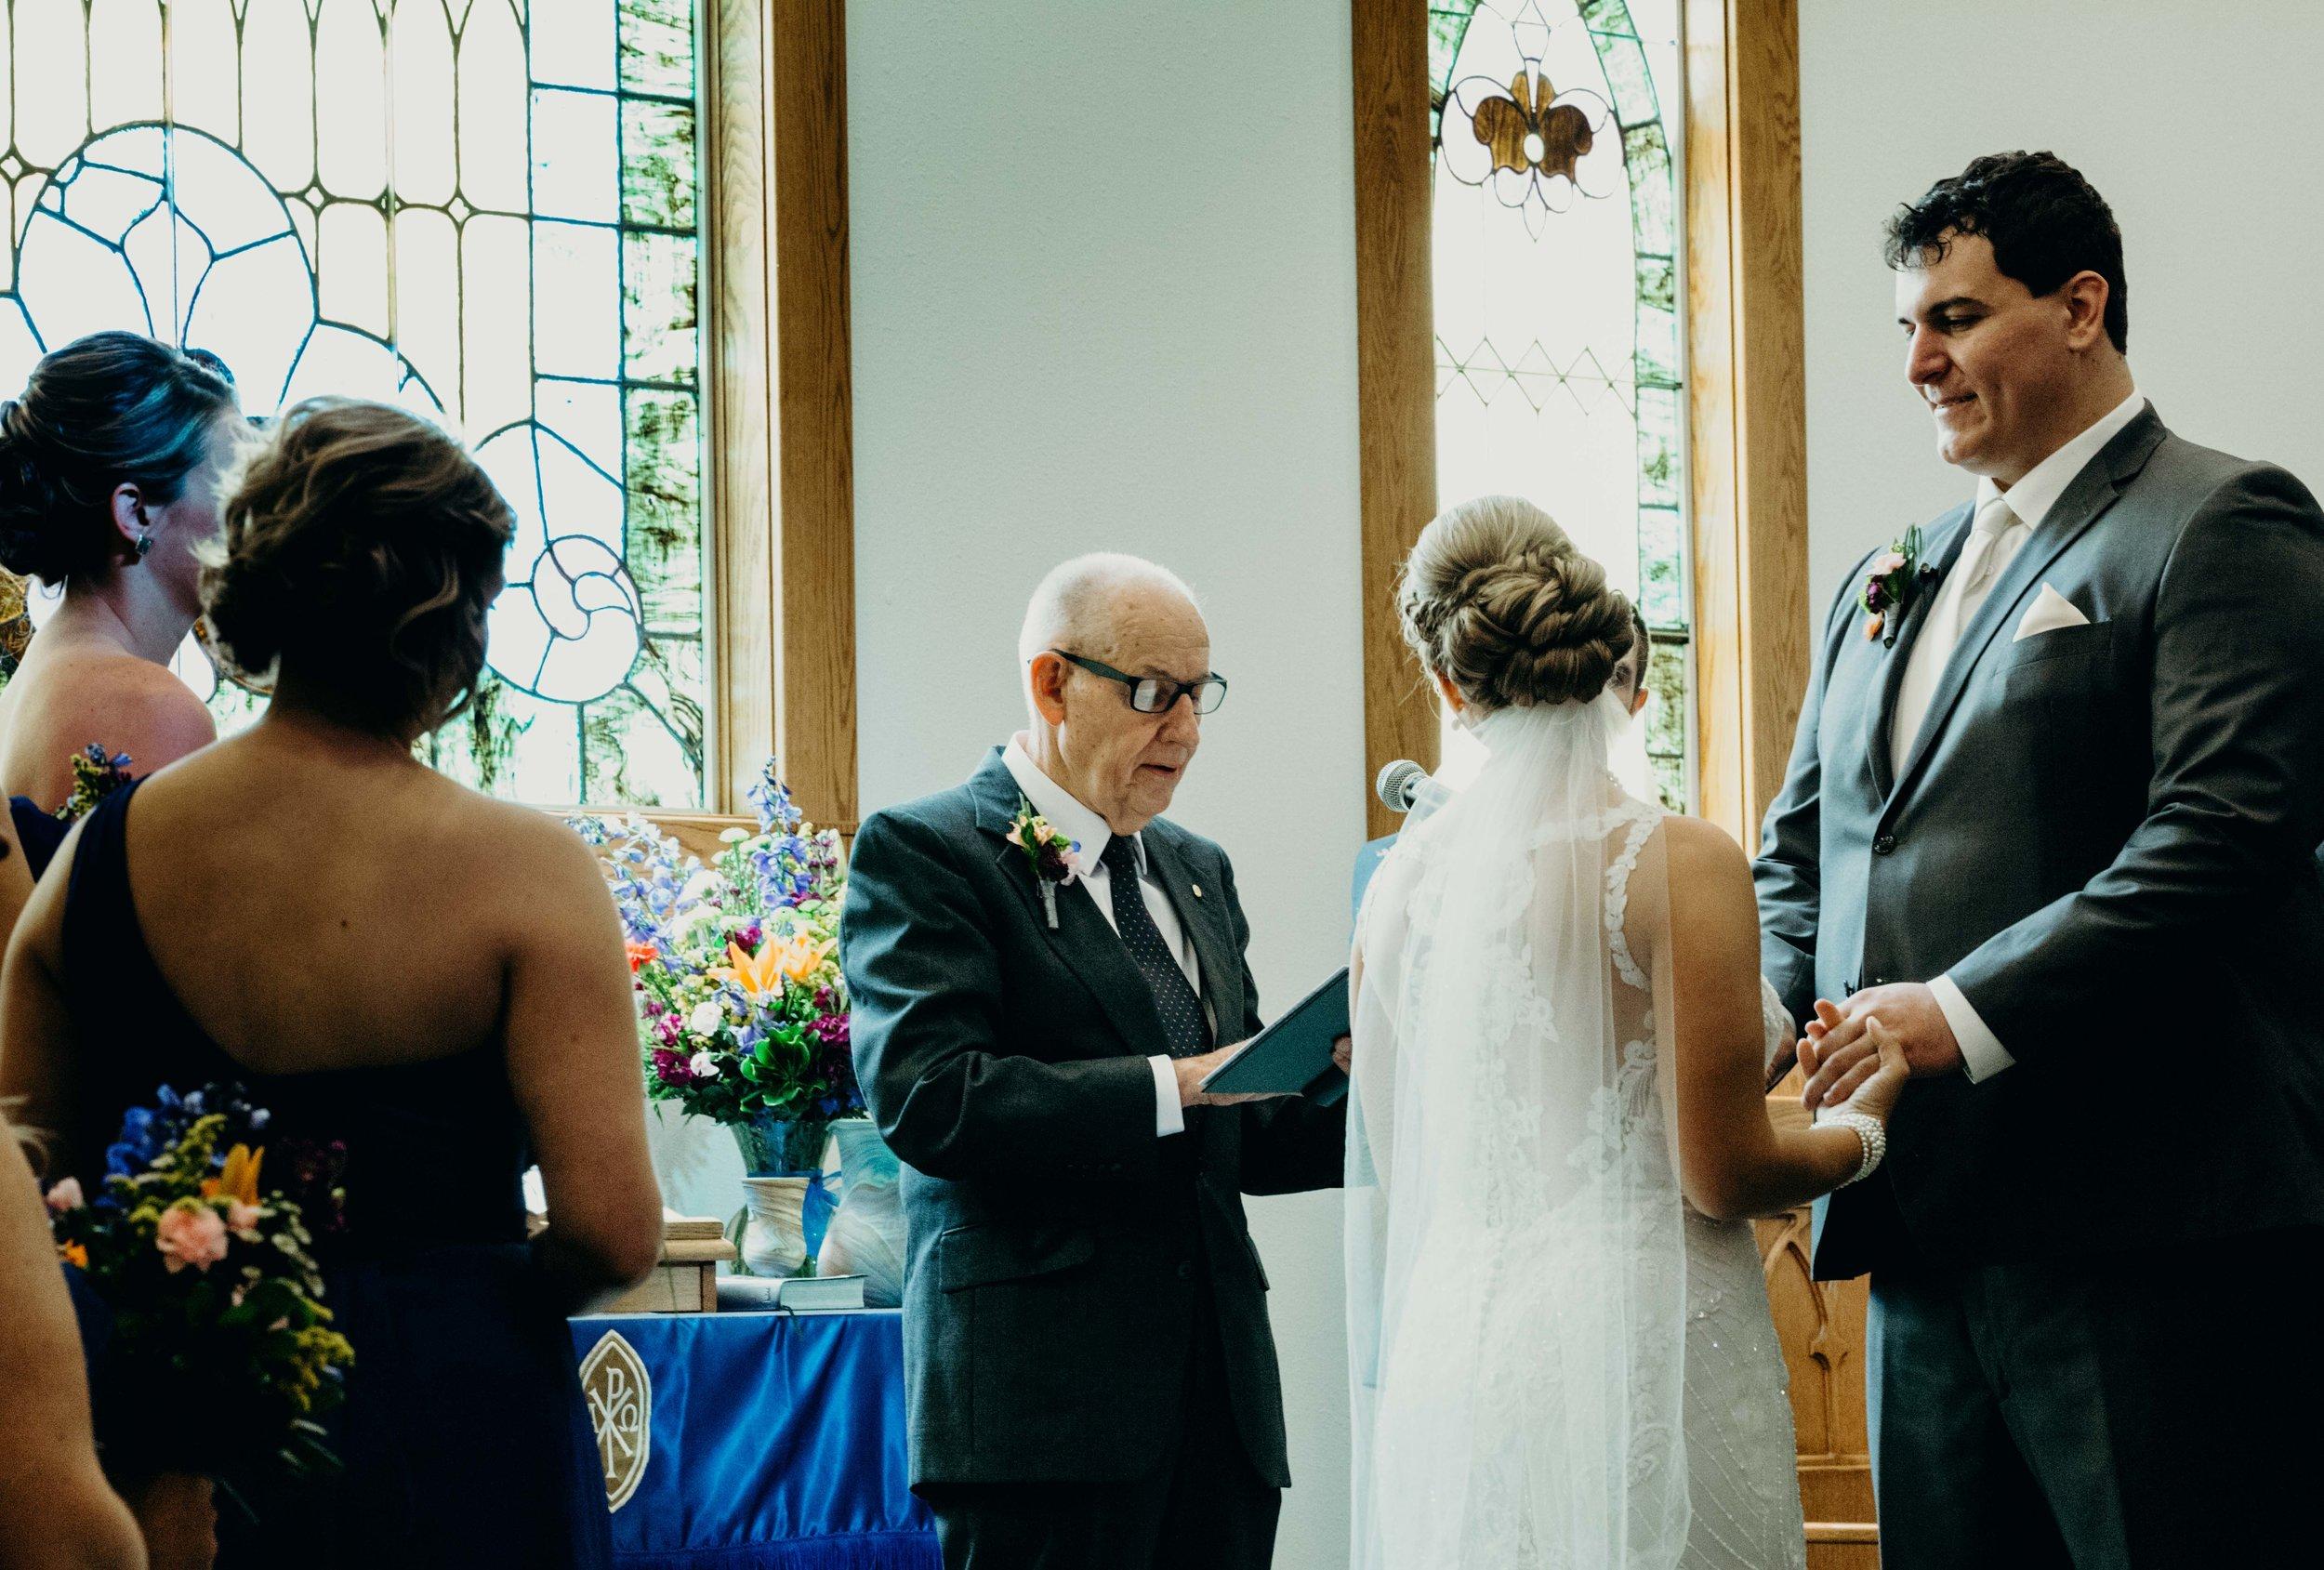 Iowa wedding_Dawn McClannan Photo-42.jpg